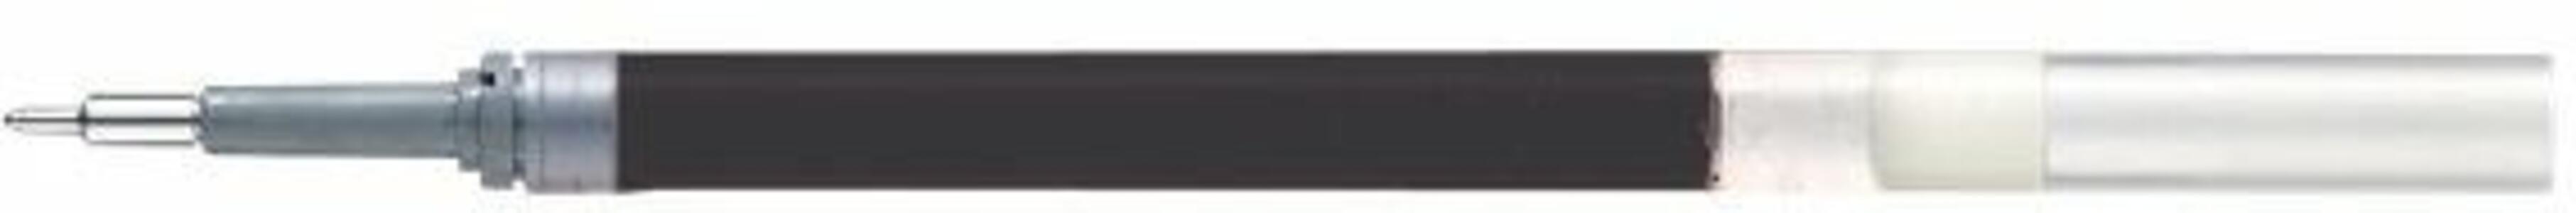 Ricarica Pentel Energel ad ago. Inchiostro nero 0,5 mm